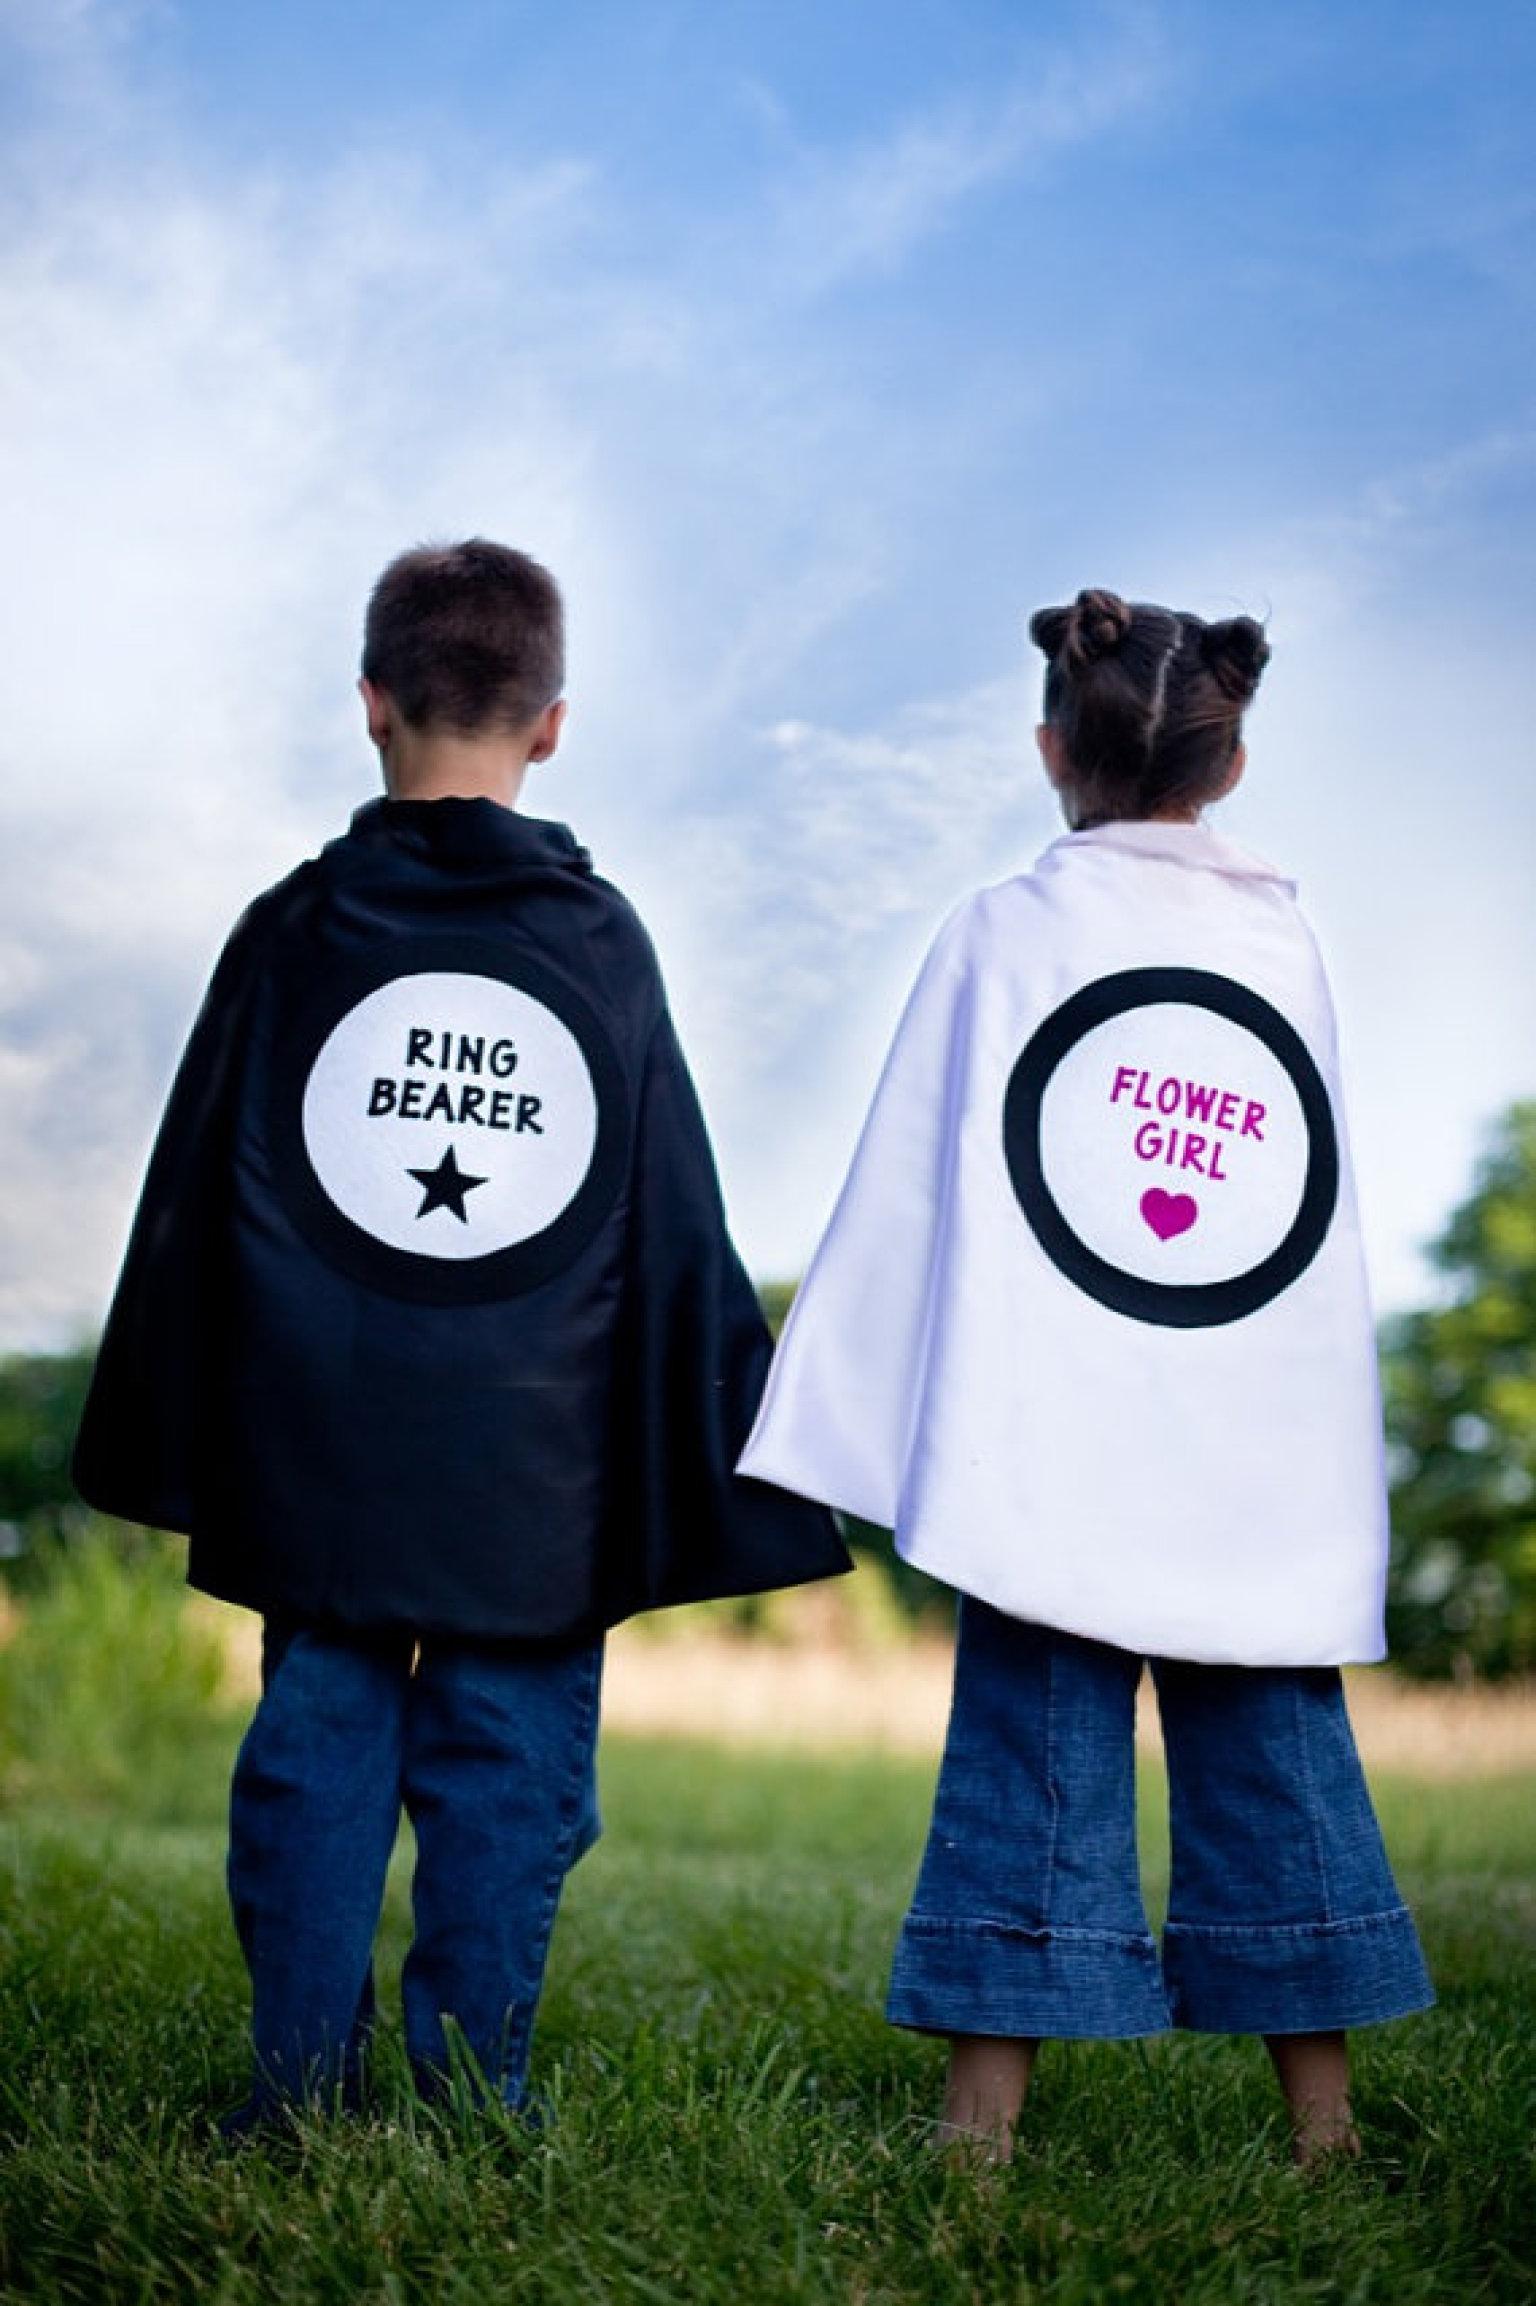 Superhero Wedding Inspiration For Comic Loving Couples (PHOTOS) | HuffPost